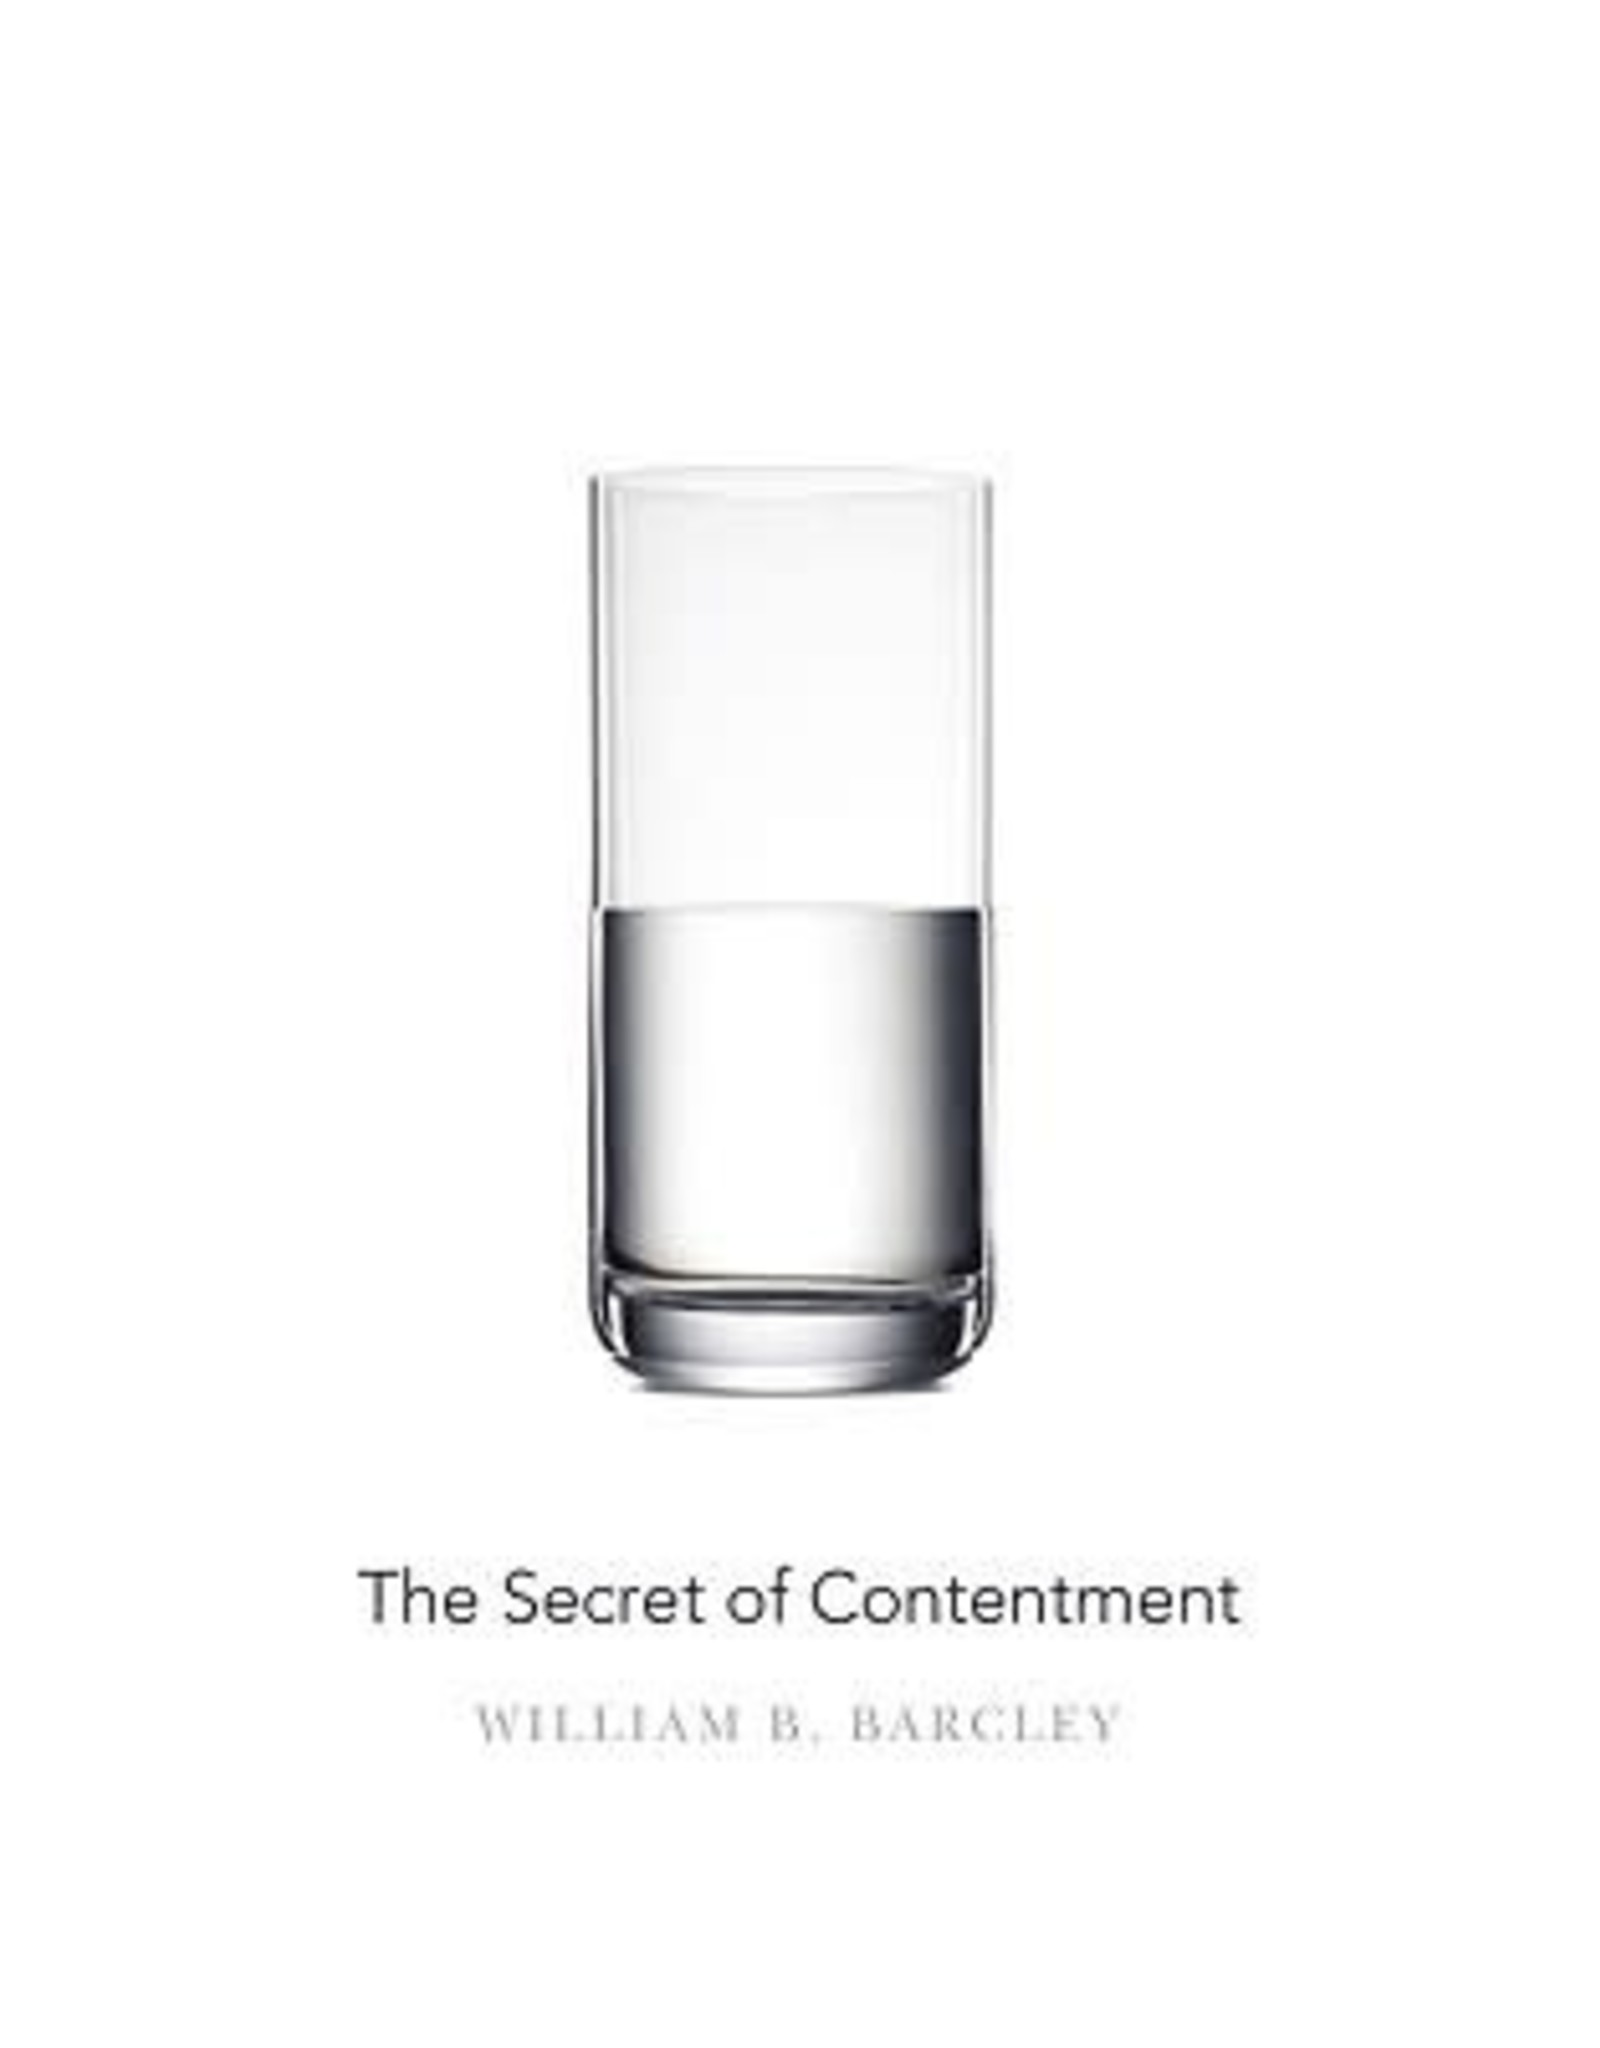 Barcley The Secret of Contentment